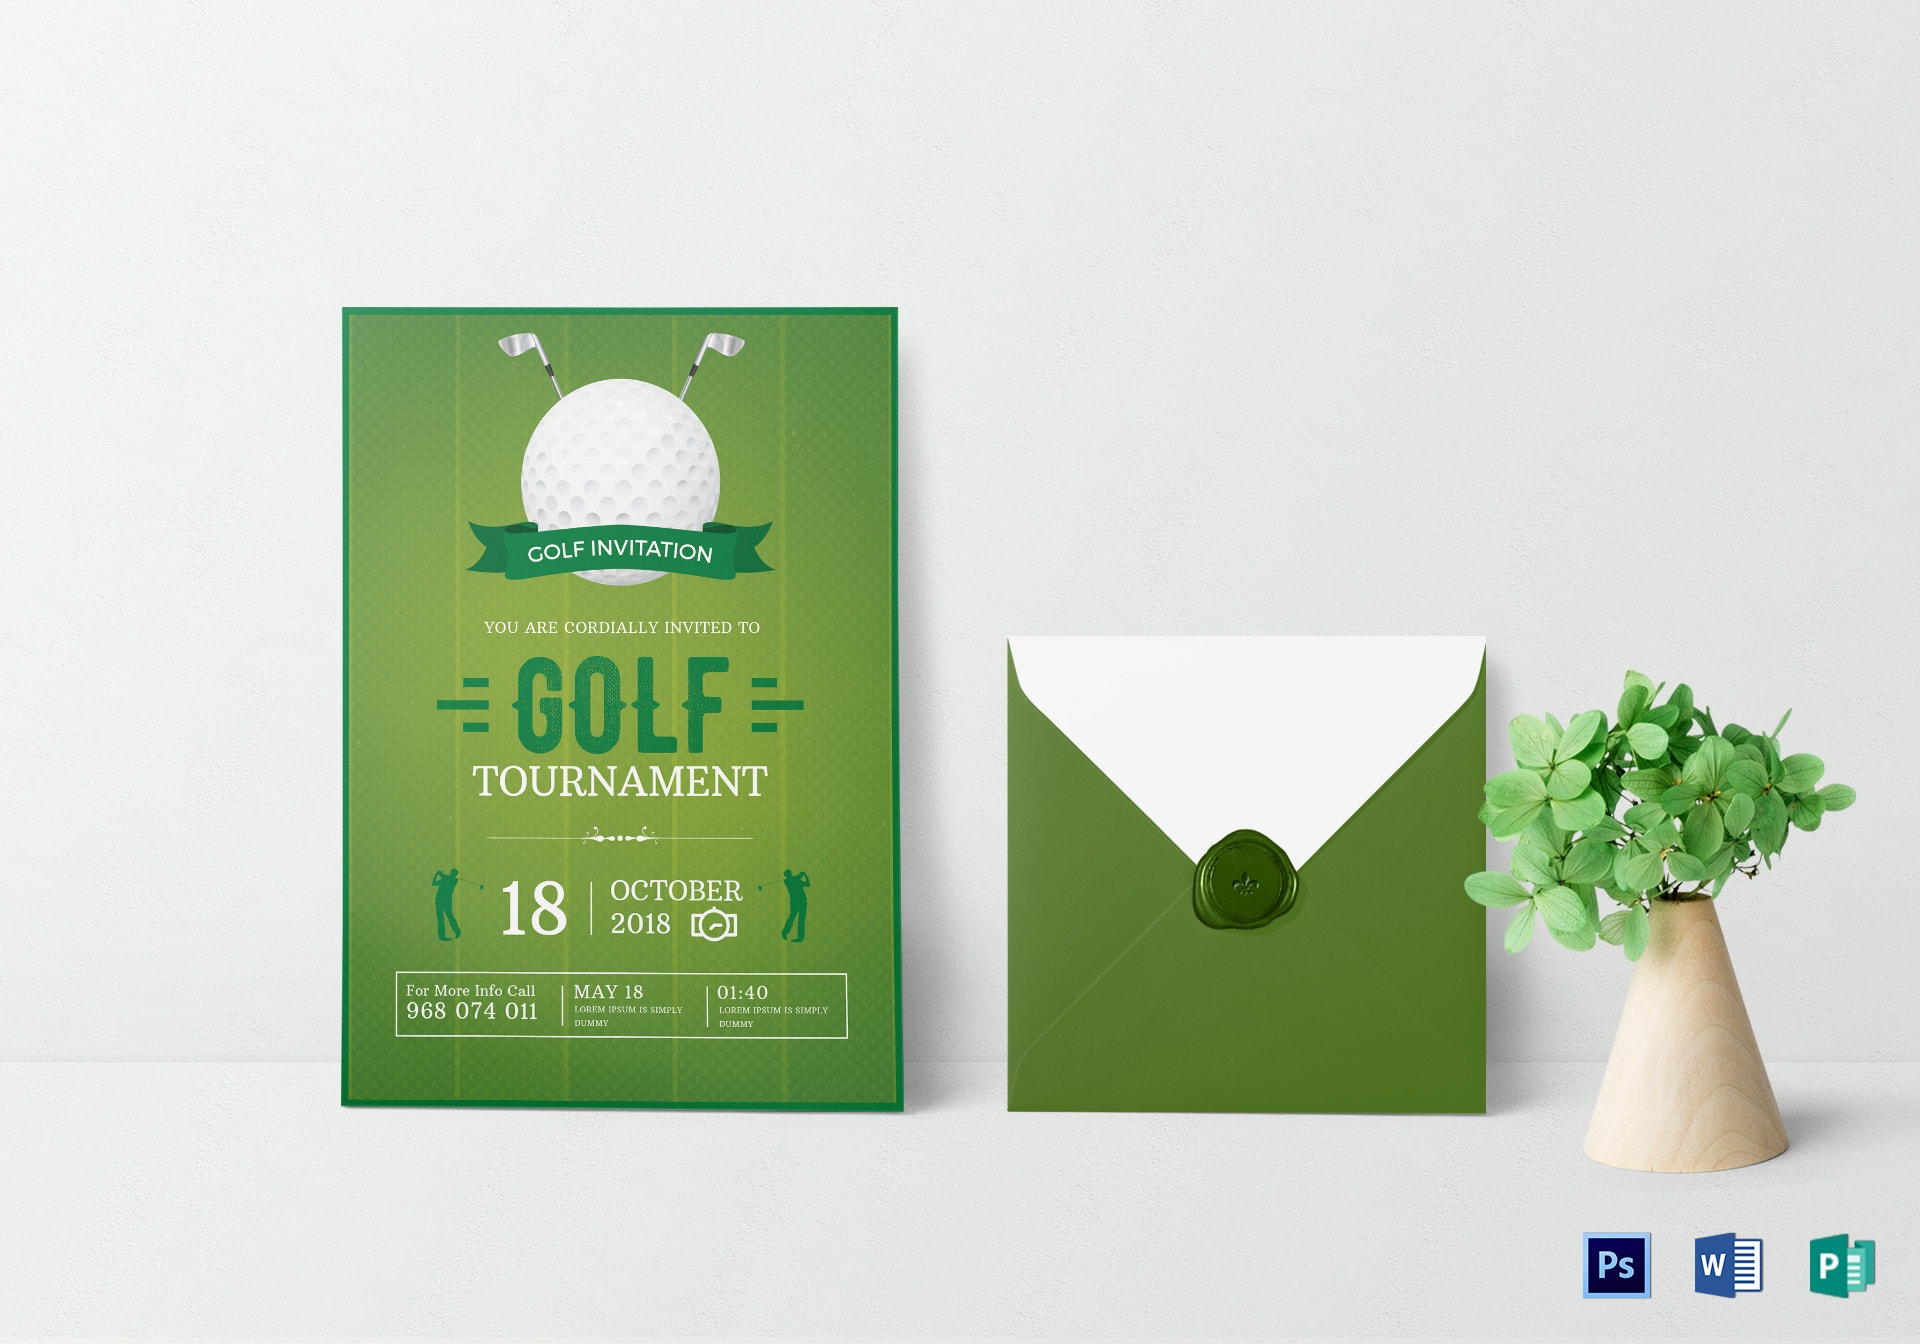 golf tournament invitation card template